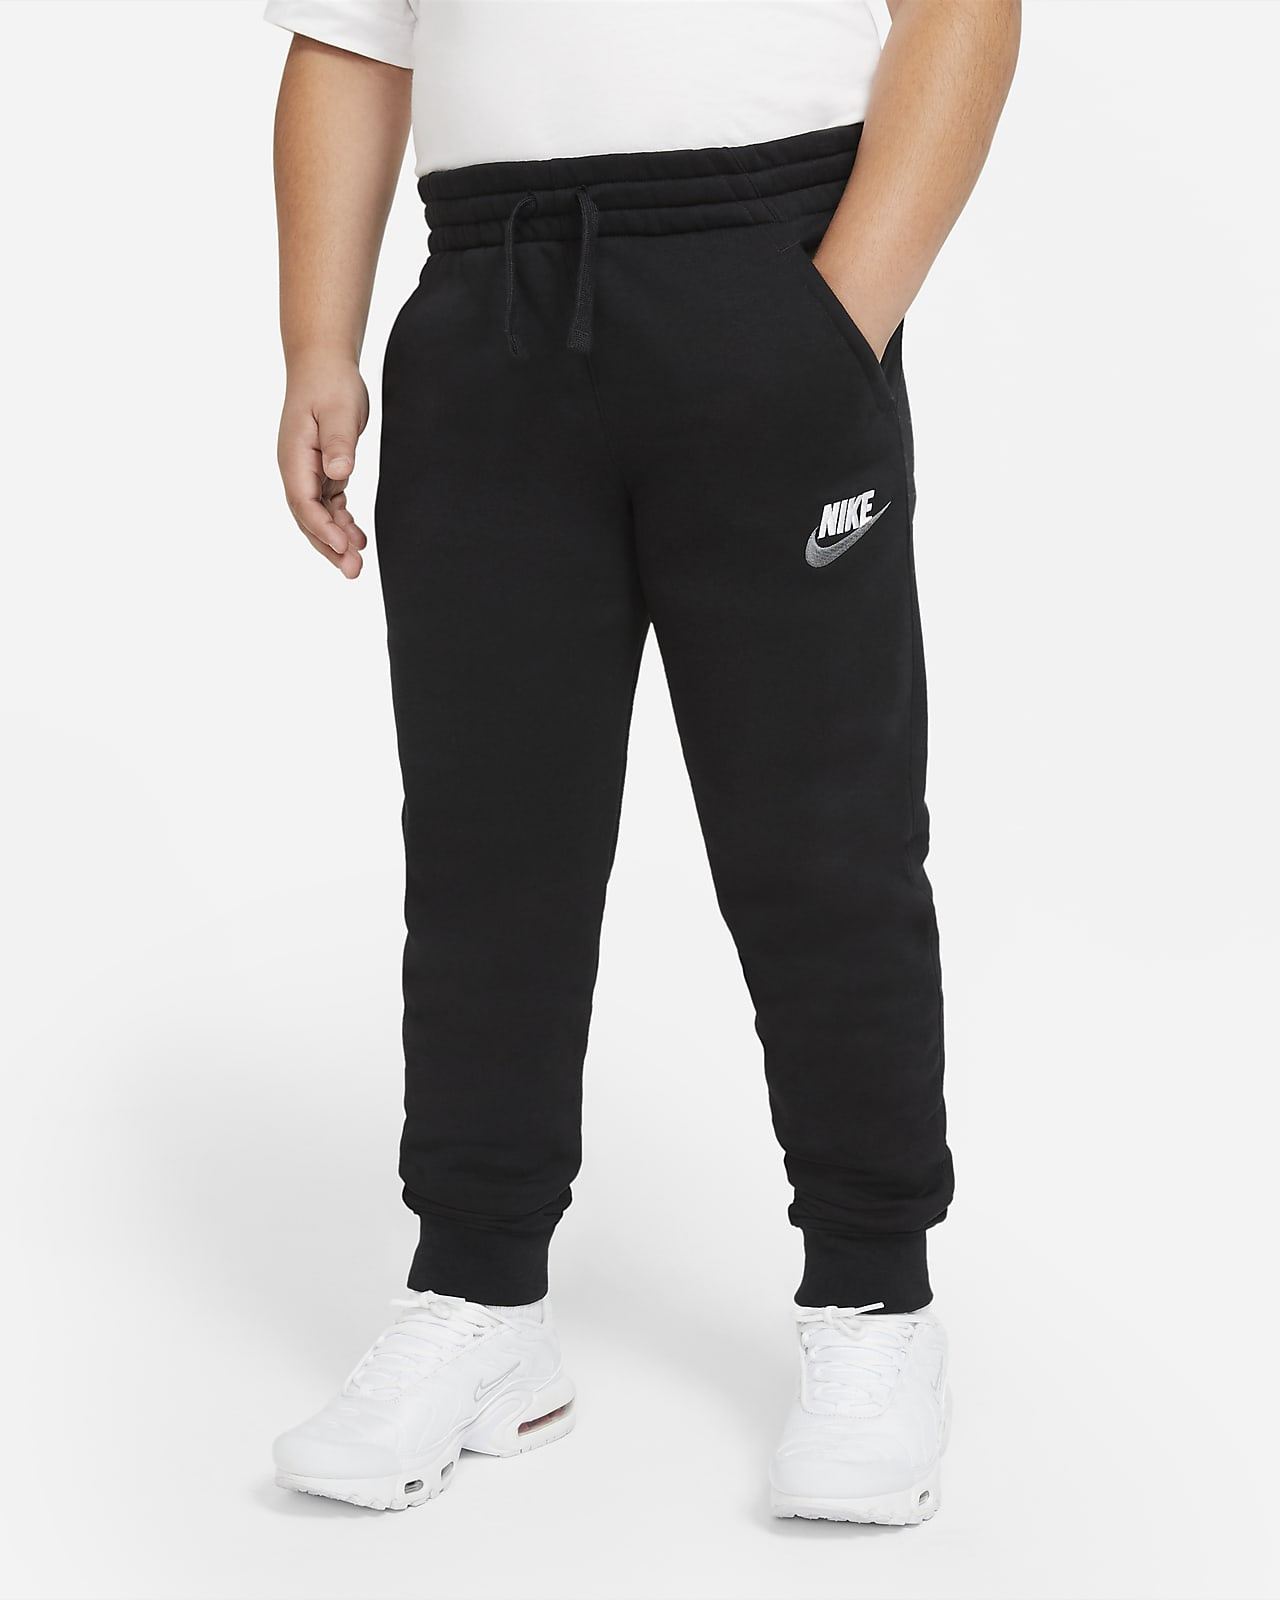 Pantalon de survêtement Nike Sportswear Club Fleece pour Garçon plus âgé (grande taille)